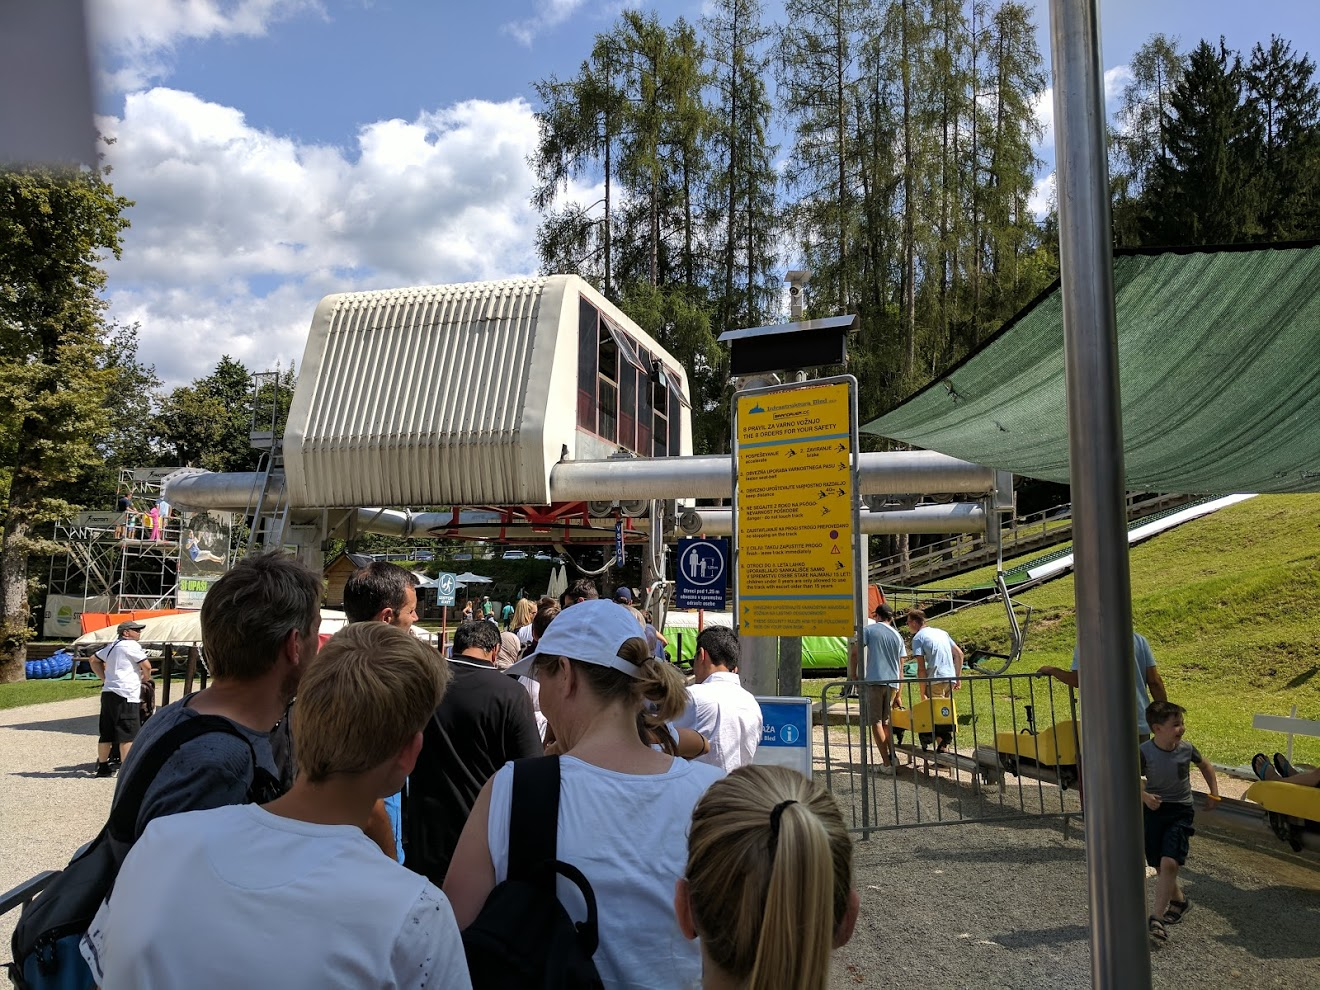 straza bled summer chairlift